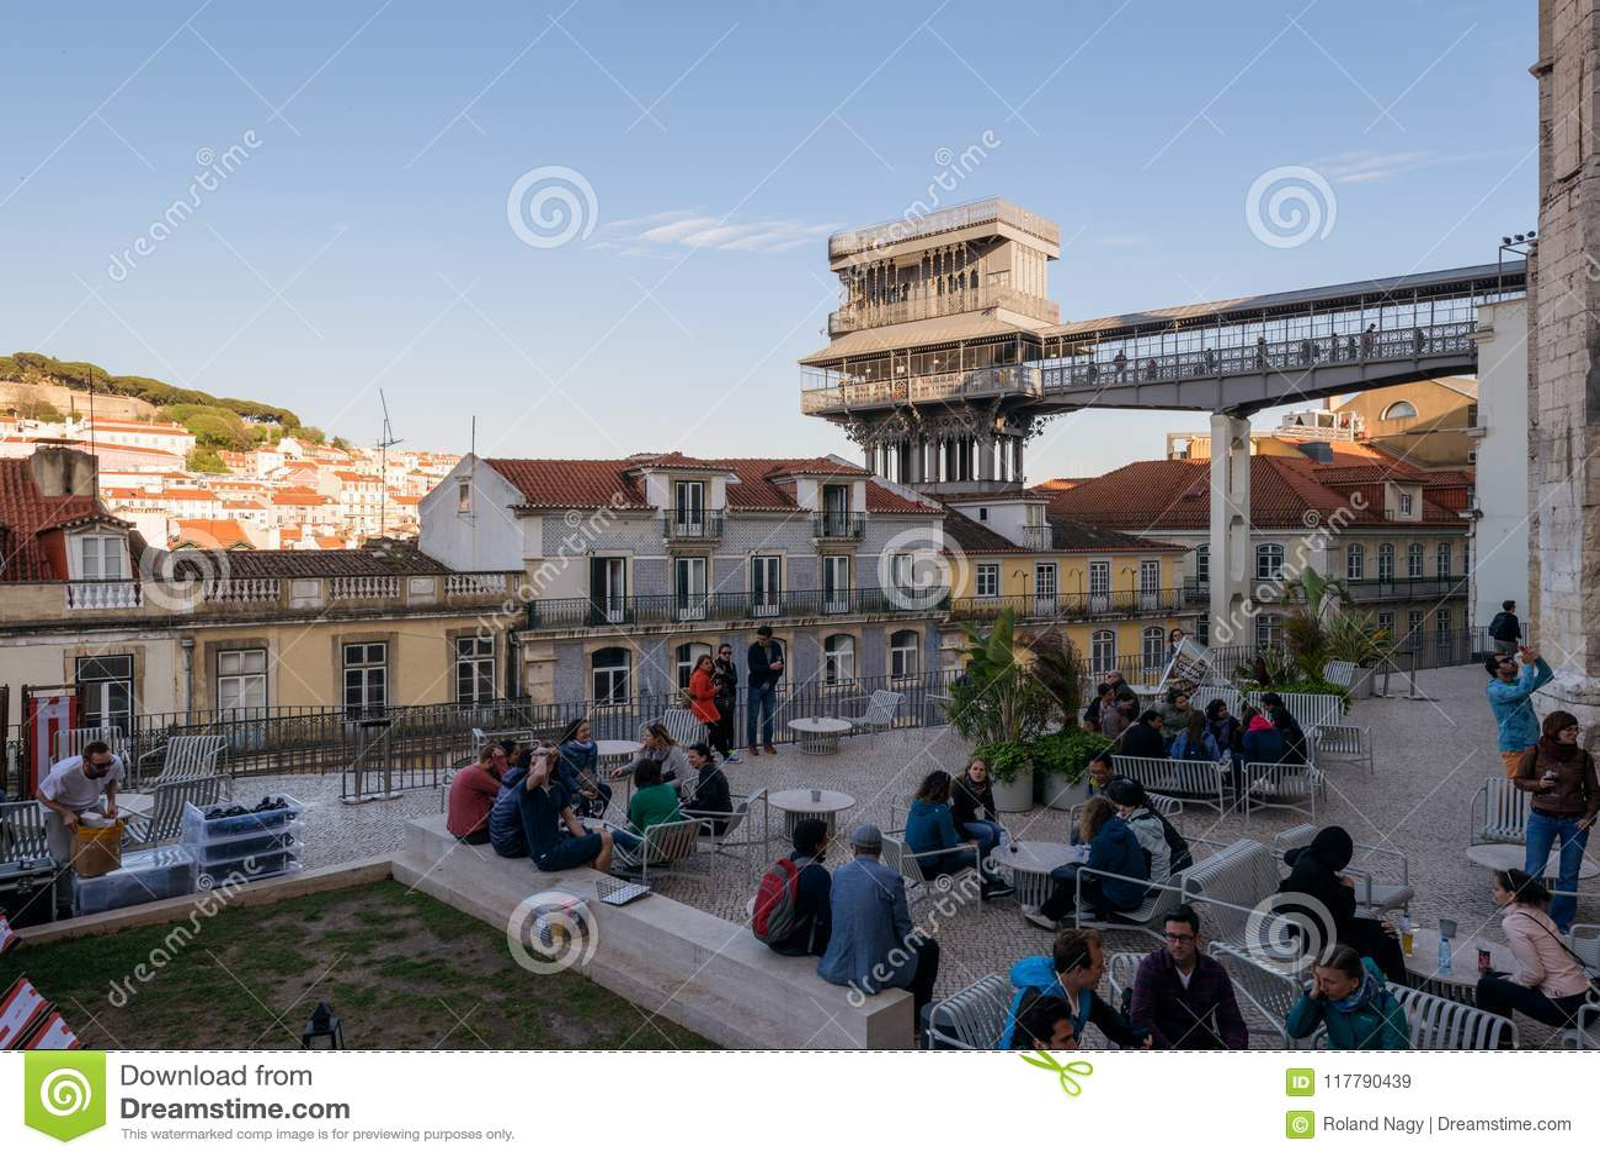 Santa Justa Lift, Lisbon, Portugal Editorial Stock Image ... on alto do pina lisbon, portugal lisbon, santos-o-velho lisbon, prazeres lisbon, campo grande lisbon, castelo lisbon, alvalade lisbon,